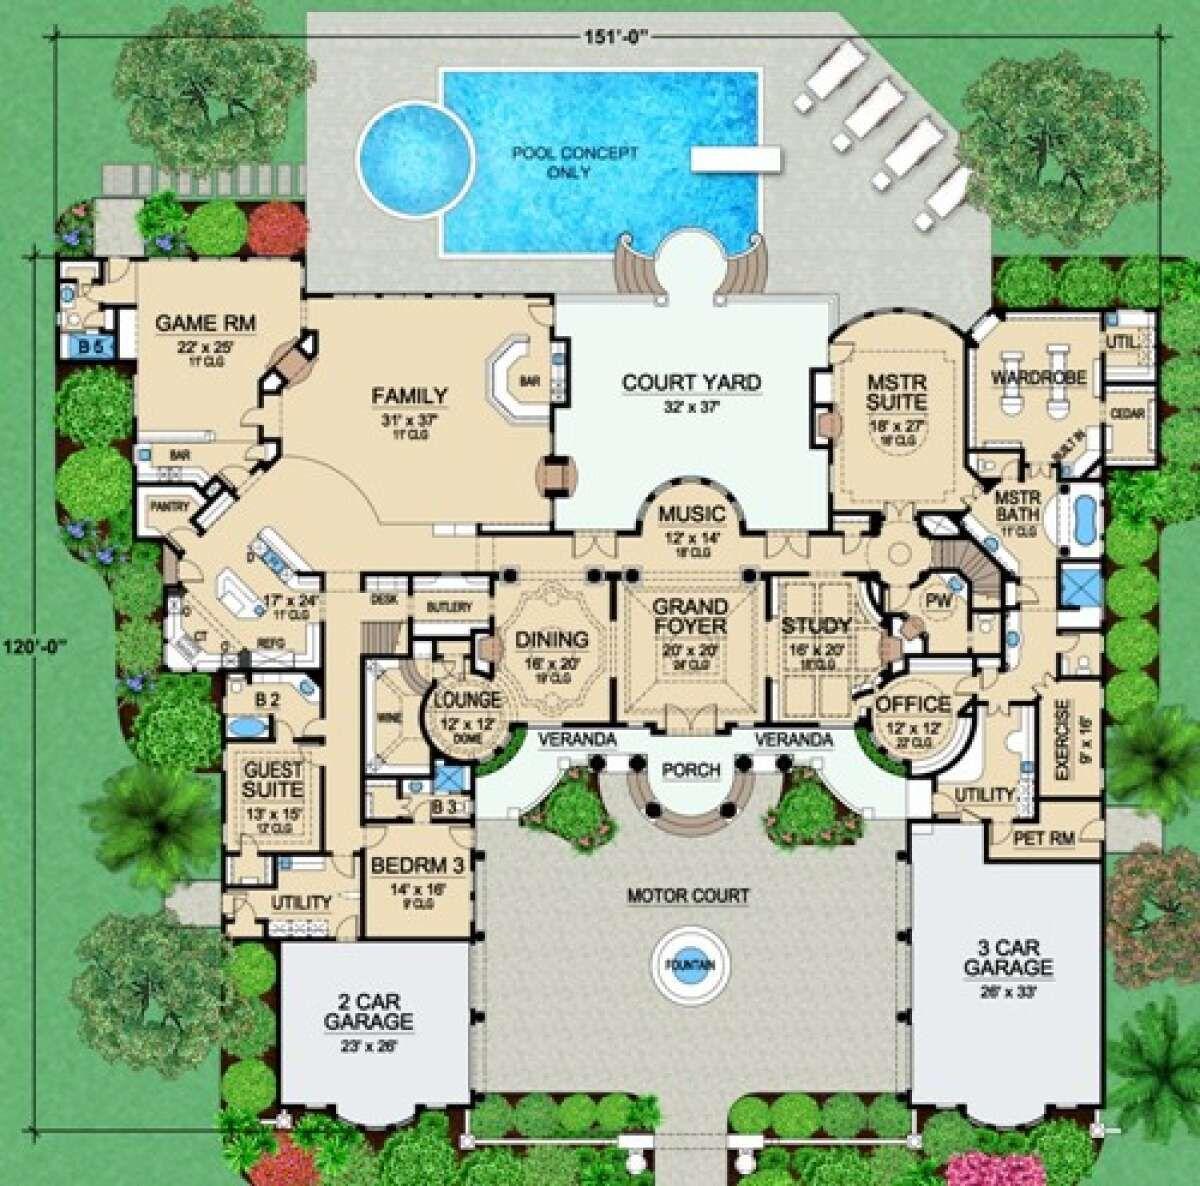 House Plan 5445 00476 Mediterranean Plan 9 253 Square Feet 4 Bedrooms 5 5 Bathrooms In 2021 House Plans Mansion Mansion Floor Plan Luxury Floor Plans